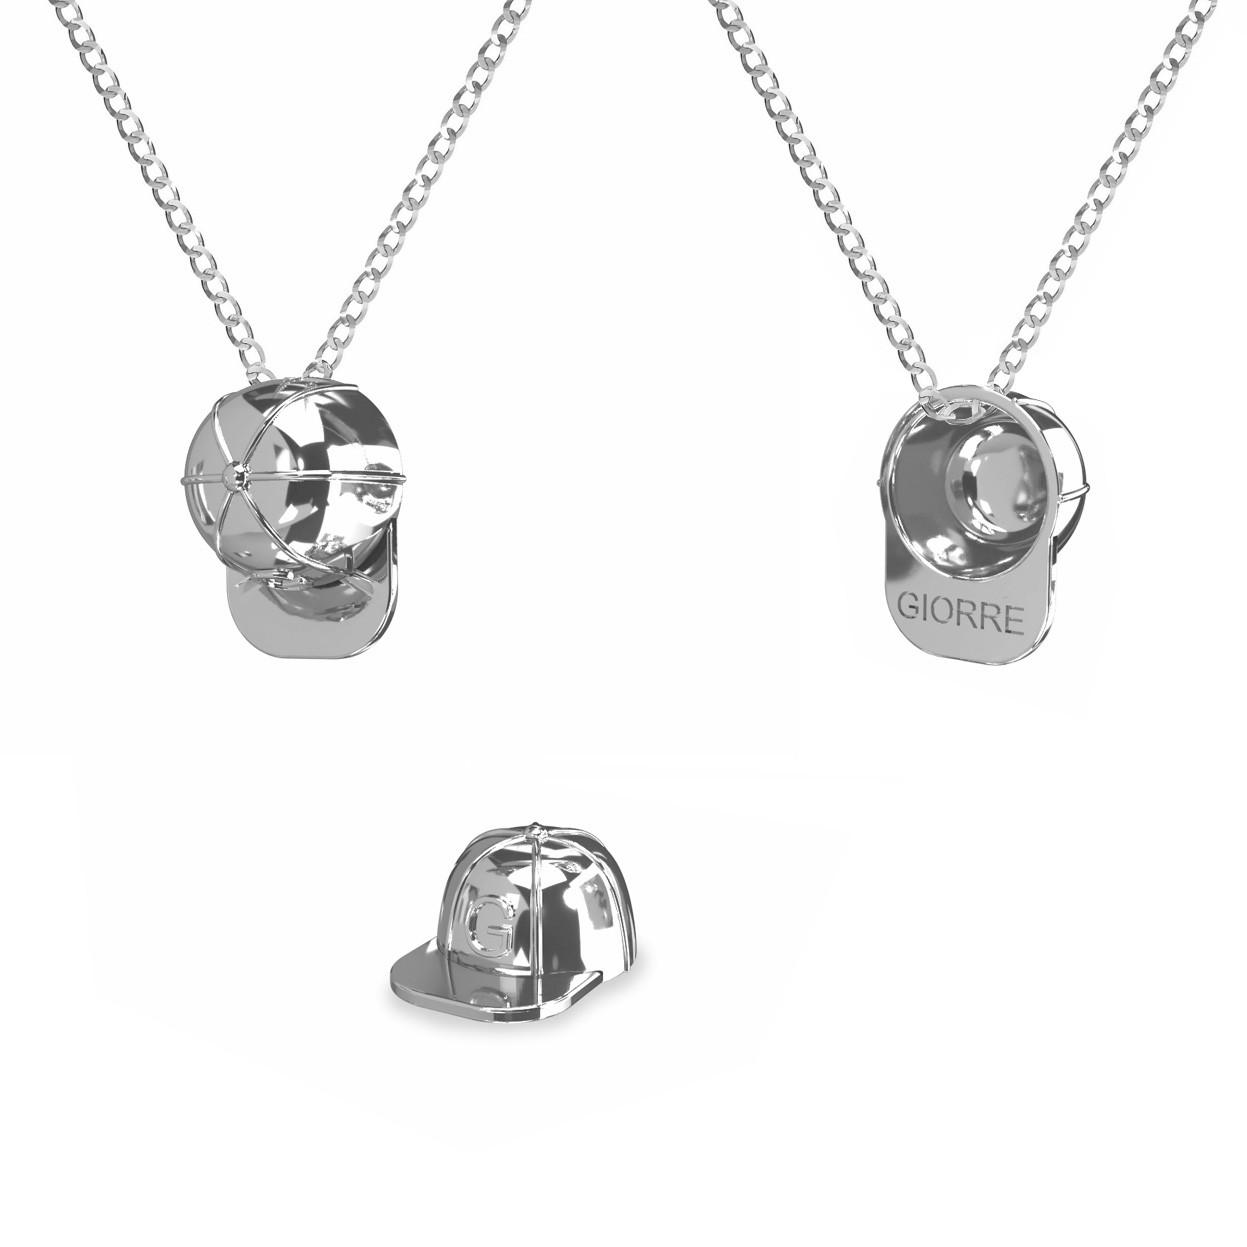 Cap girl necklace 925